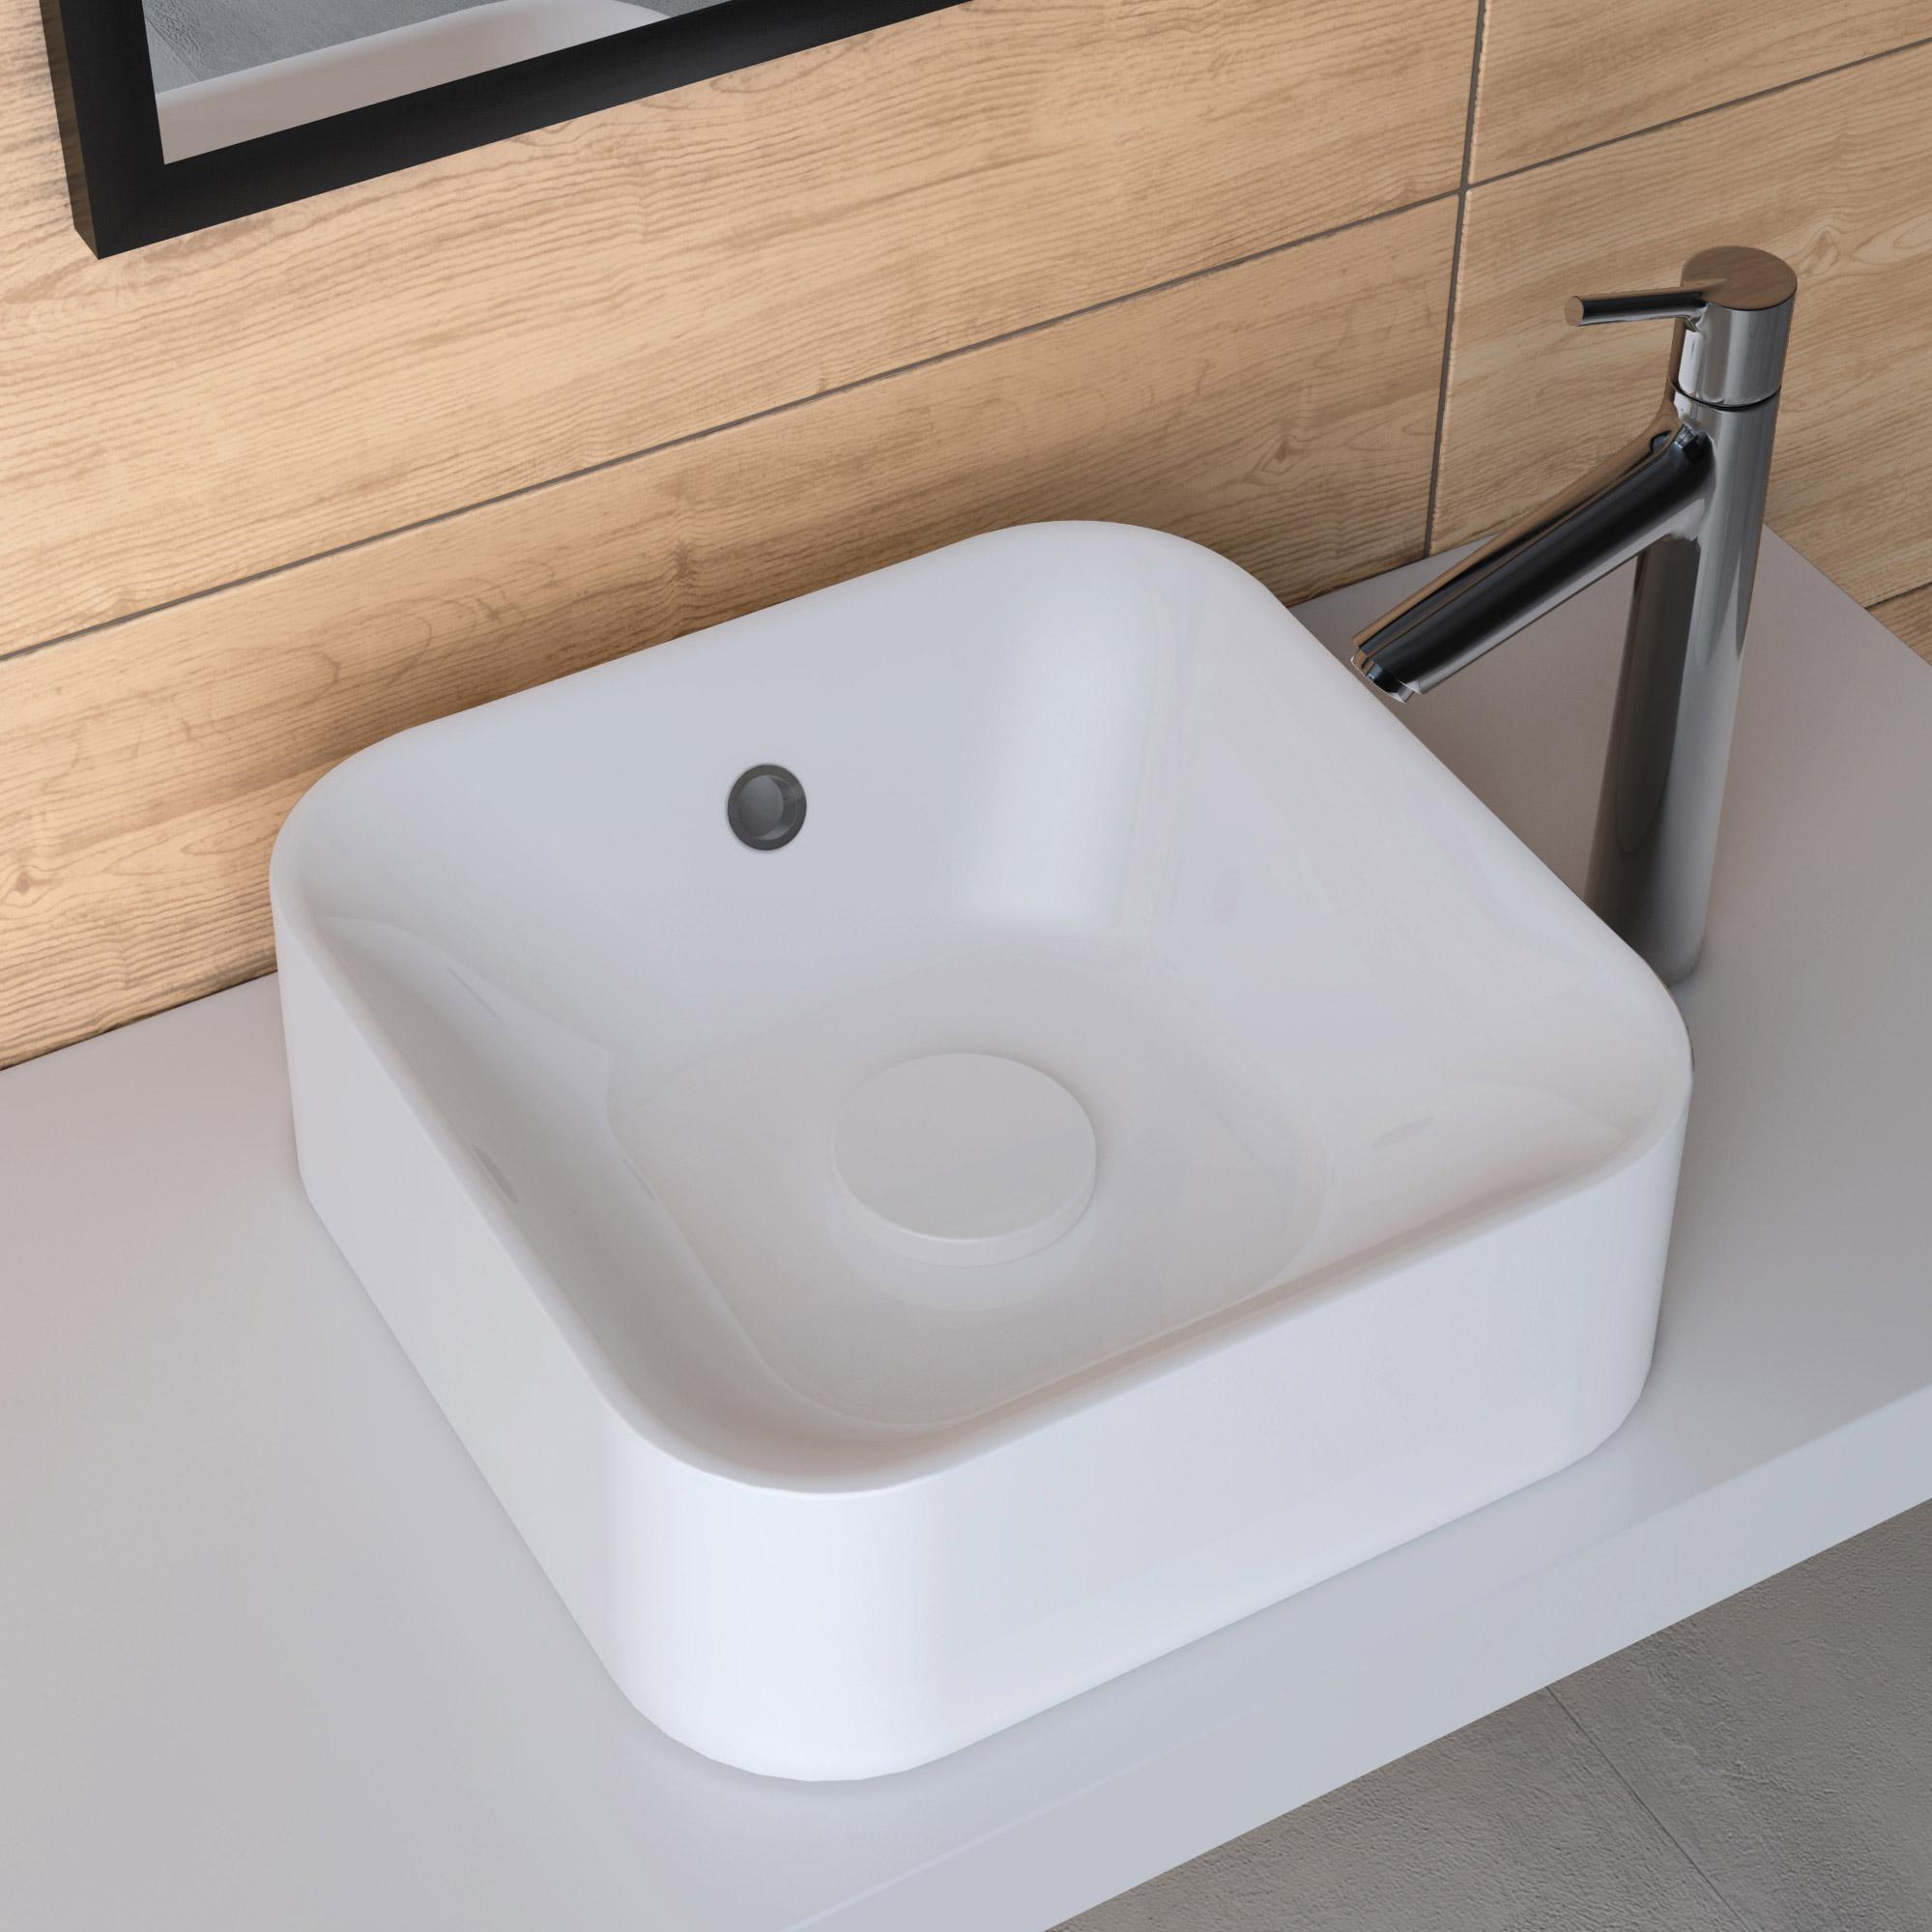 Vasque à poser résine l.38 x P.38 cm Diam.38 cm blanc